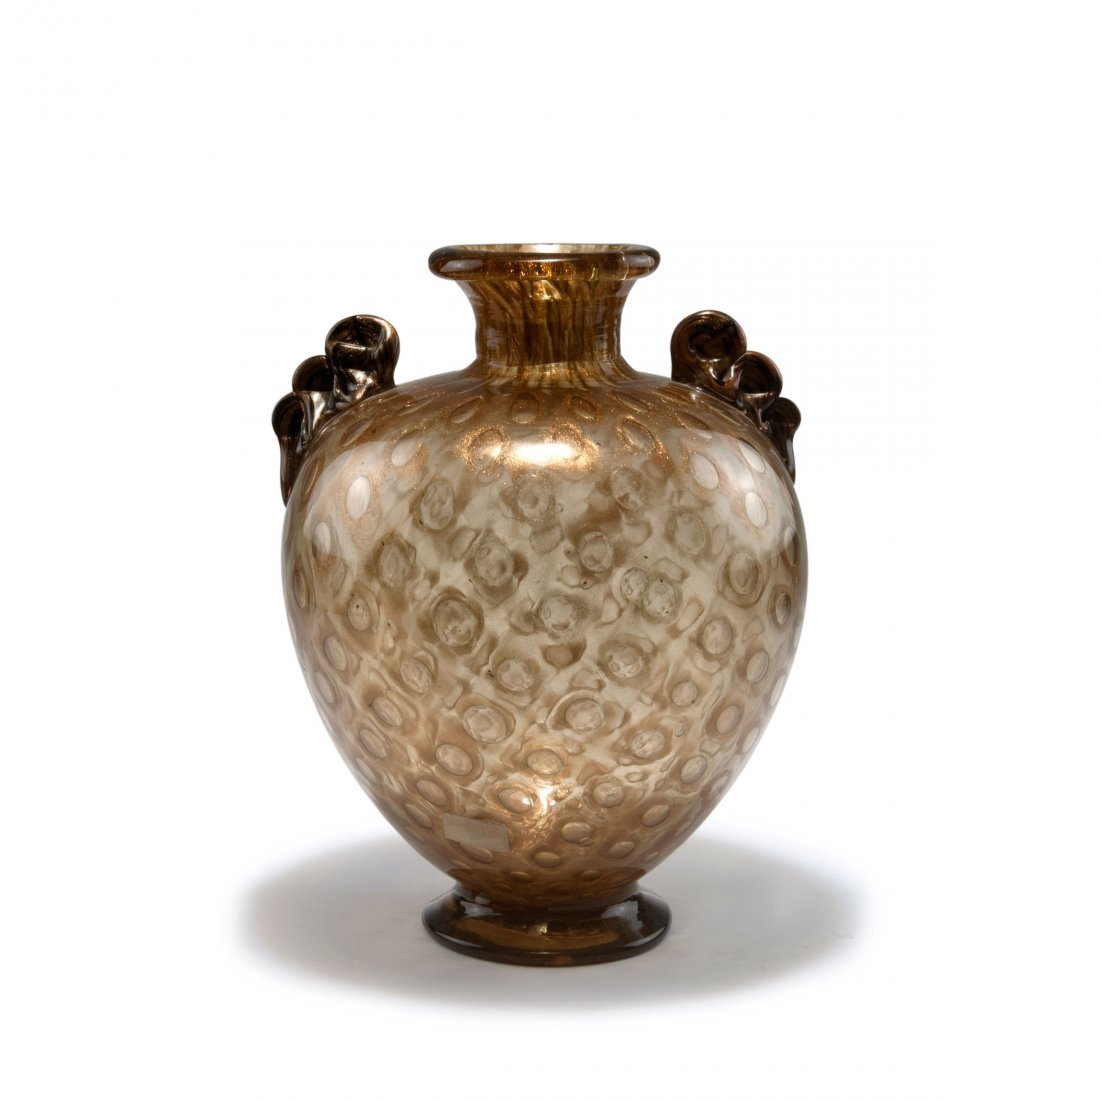 'Avventurina a bolle' vase with handles, c1936